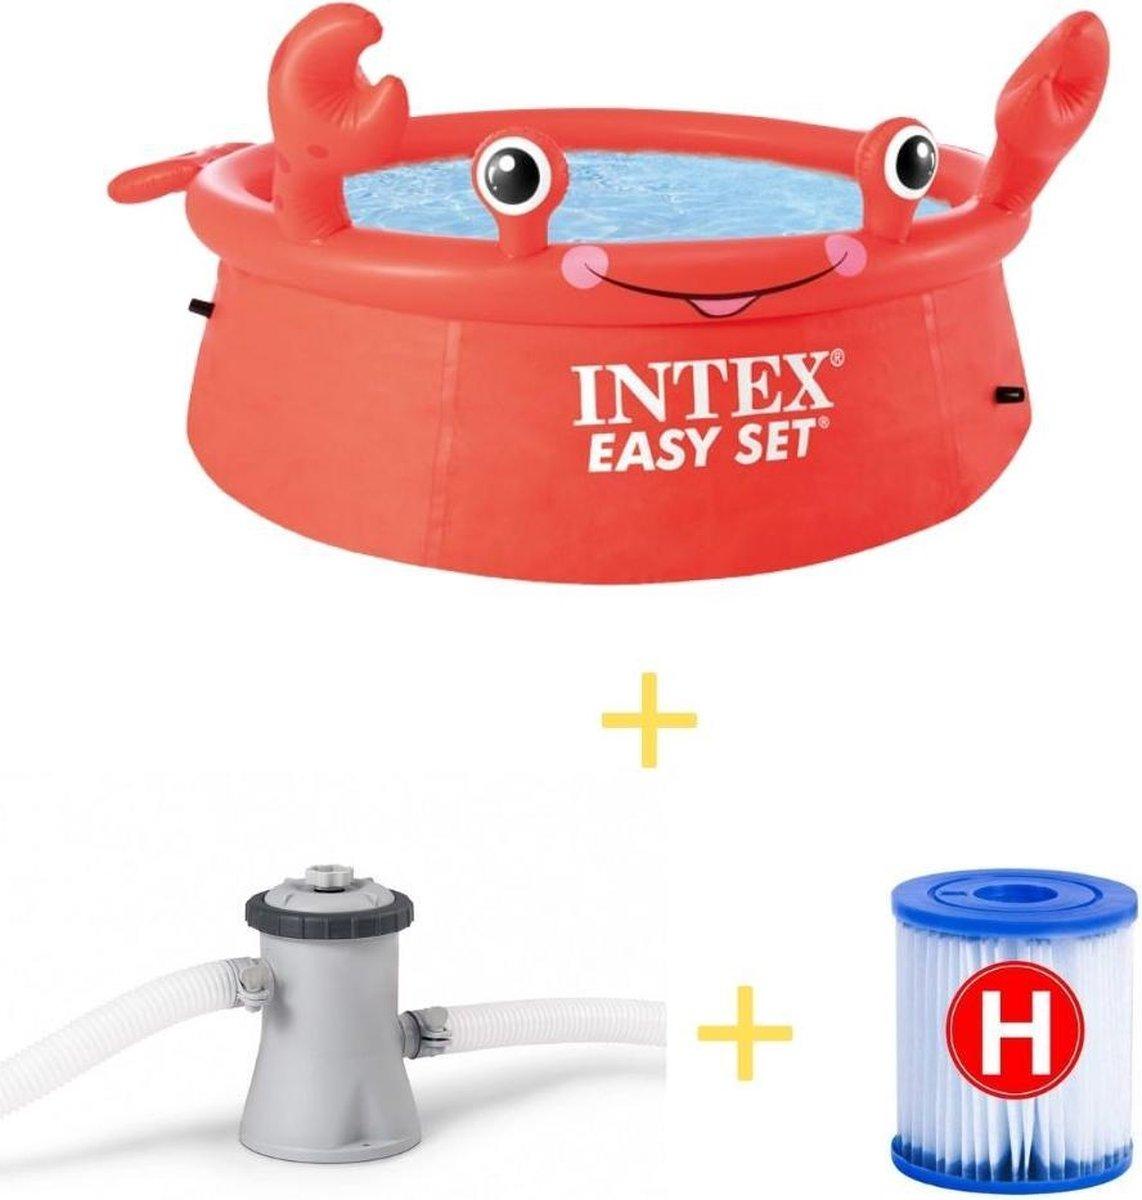 Intex Zwembad - Easy Set - 183 cm - Krab editie - Inclusief Filterpomp & Filter